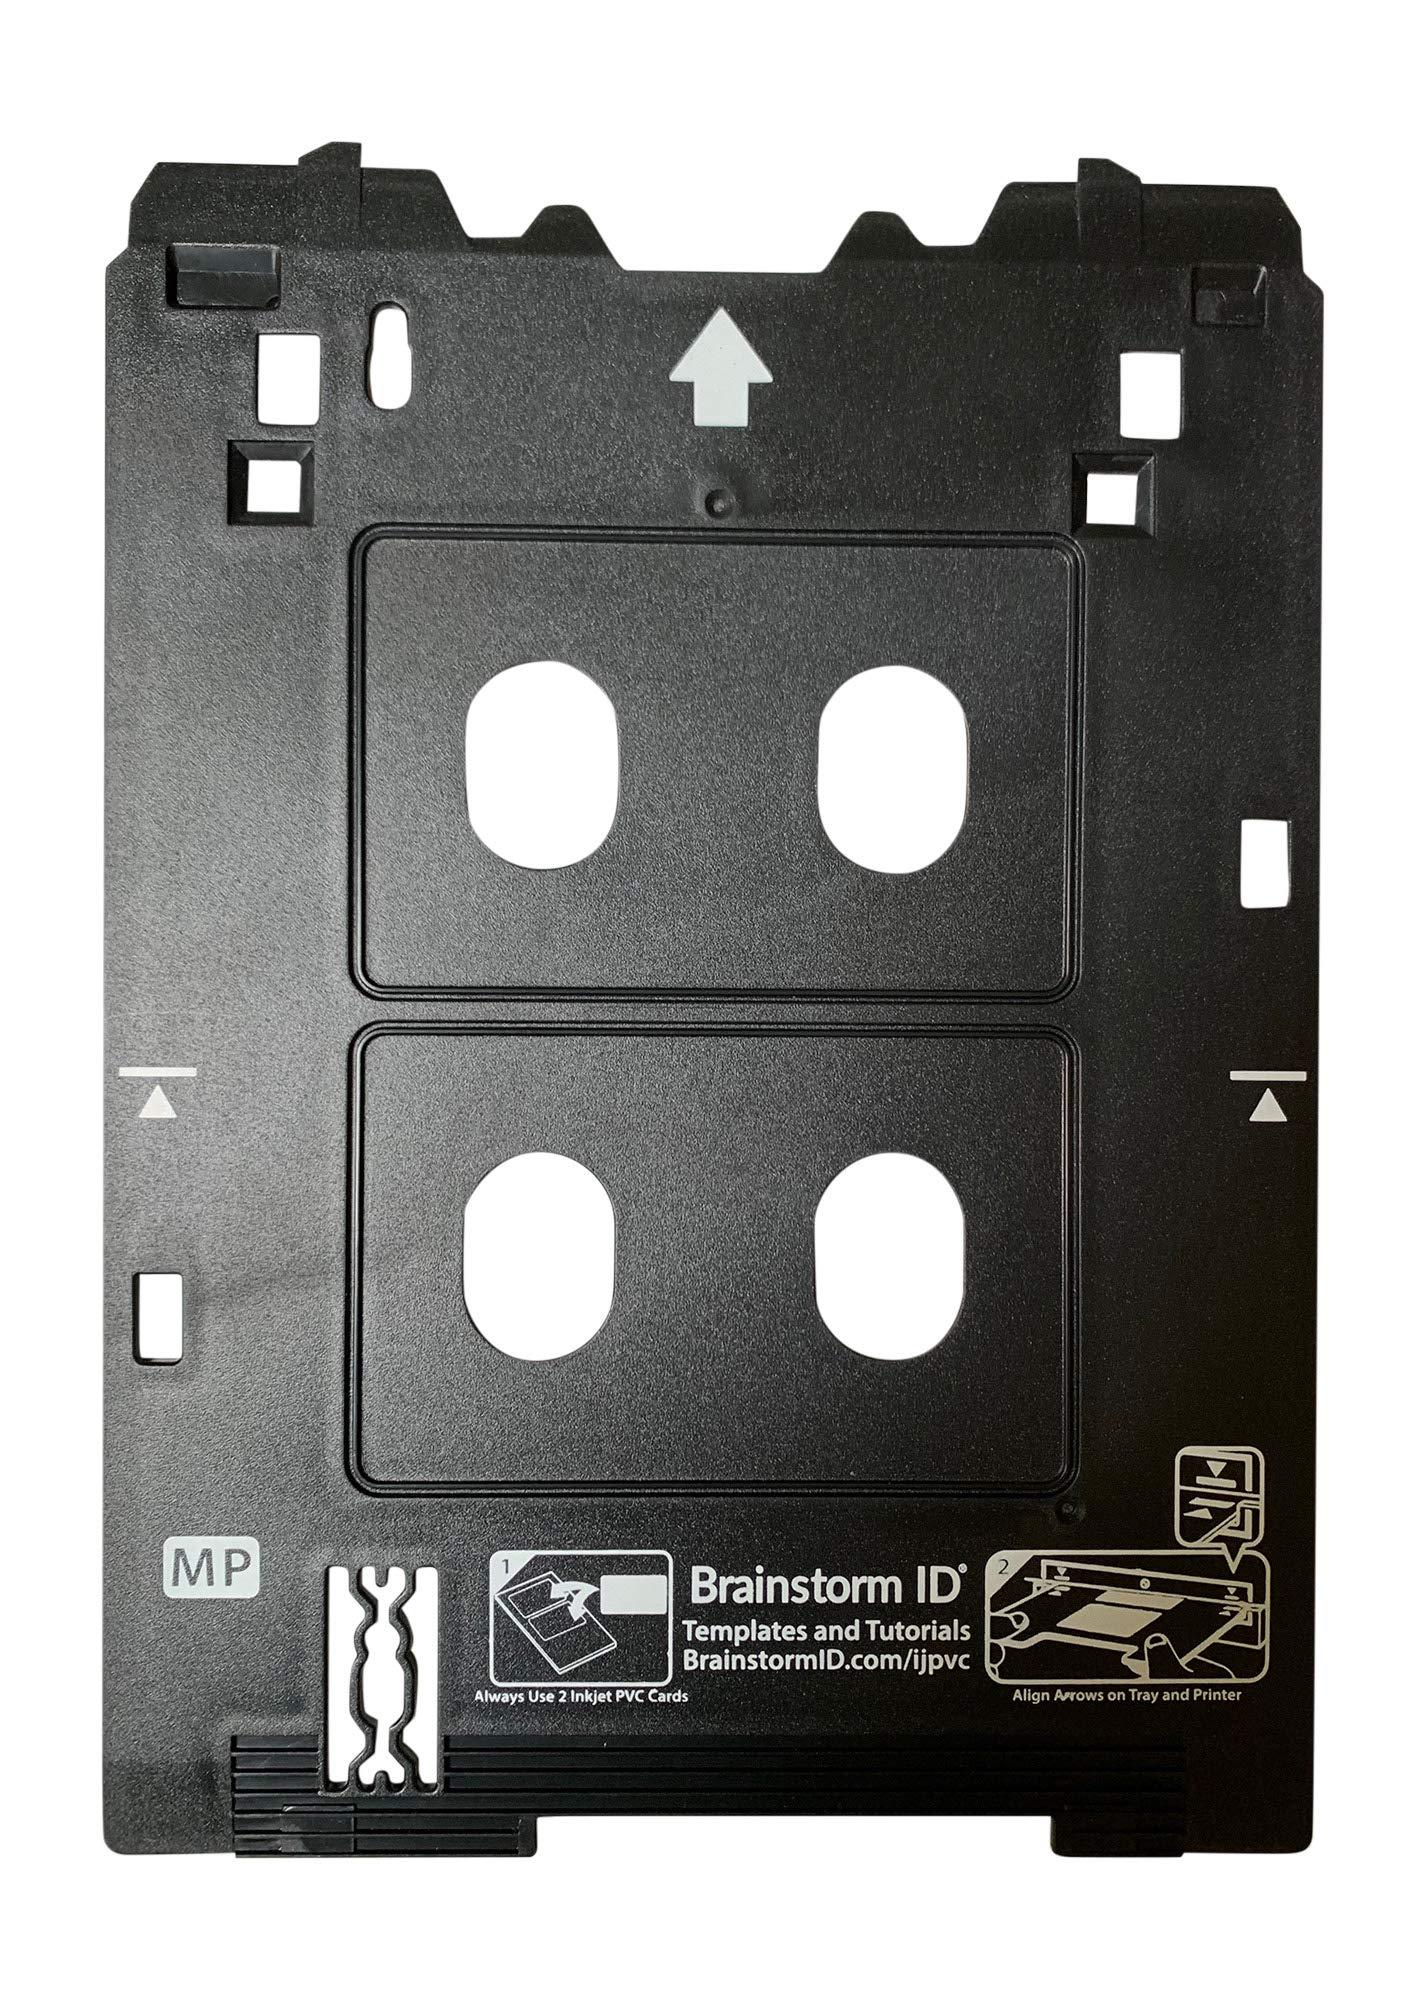 Inkjet PVC Card Tray for Canon PIXMA TS82xx, TS83xx, and TS95xx Series Printers (Canon MP/Multi-Purpose Tray Printers) by Brainstorm ID